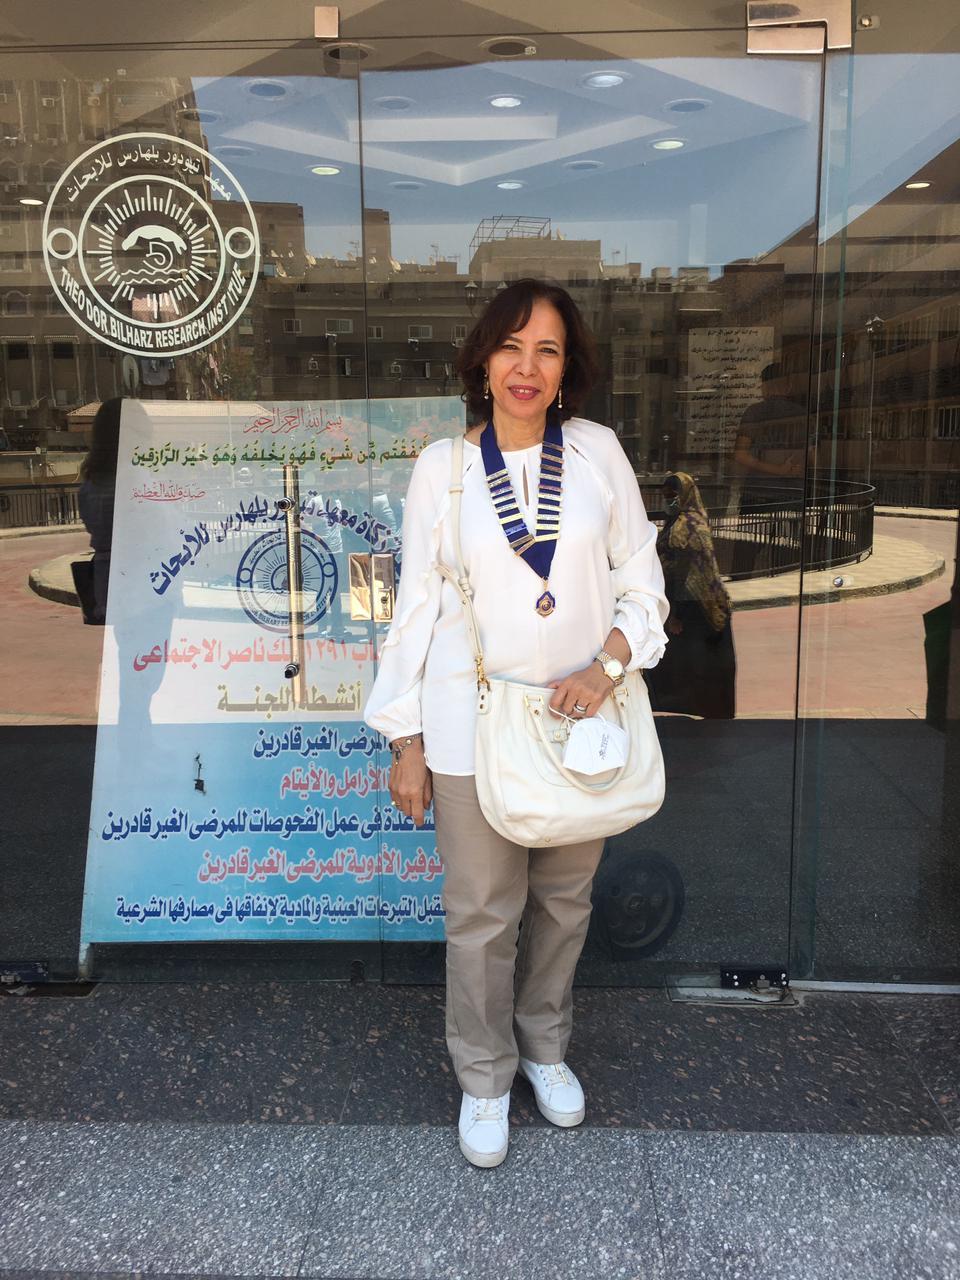 4- Dr. Asrar El Bakri President of IWC of Gezira Sporting at Theodore Bilharz Institute